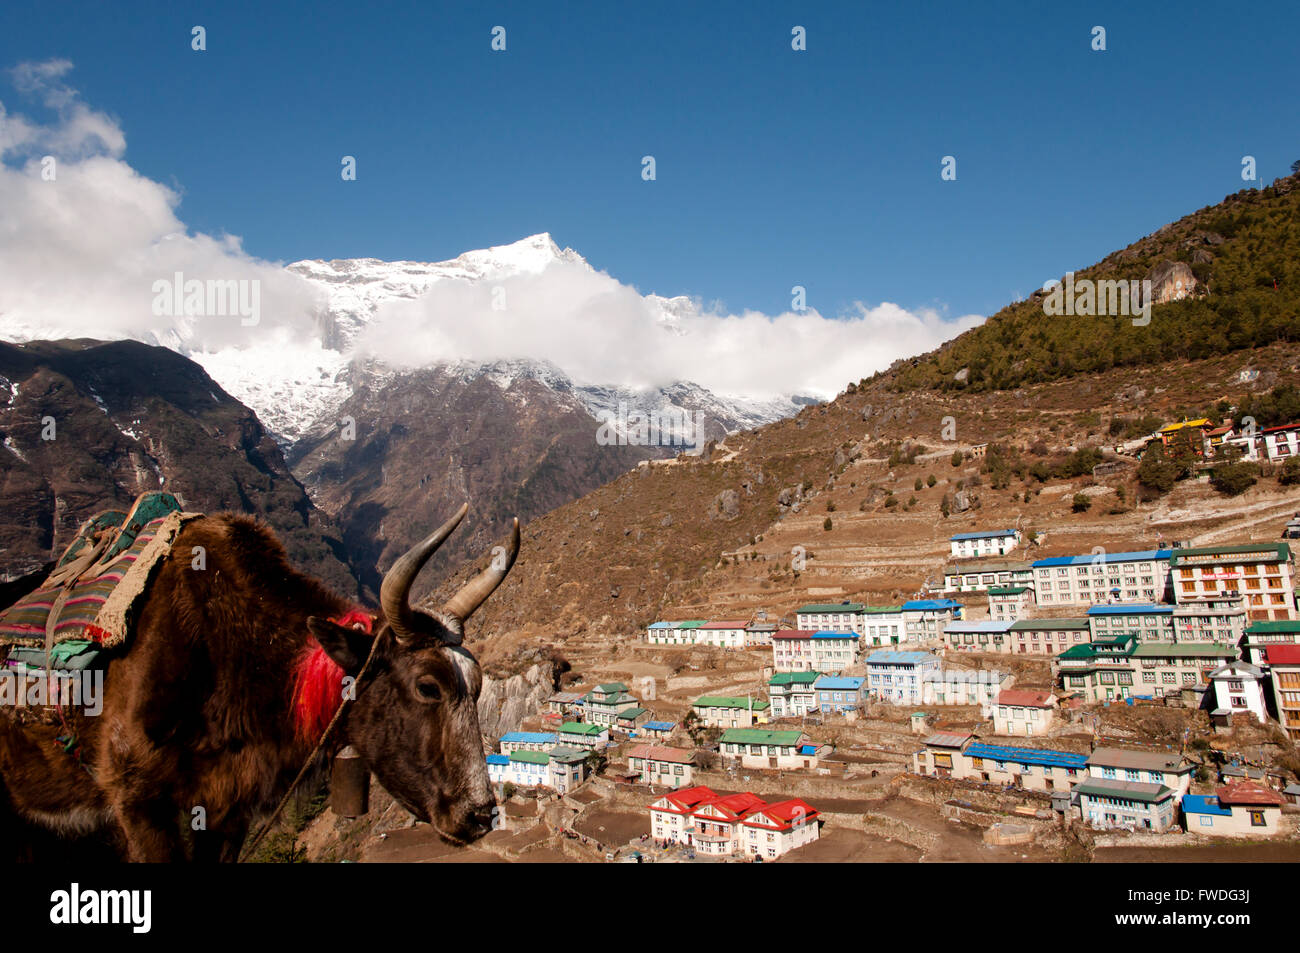 Namche Bazaar Village - Nepal - Stock Image